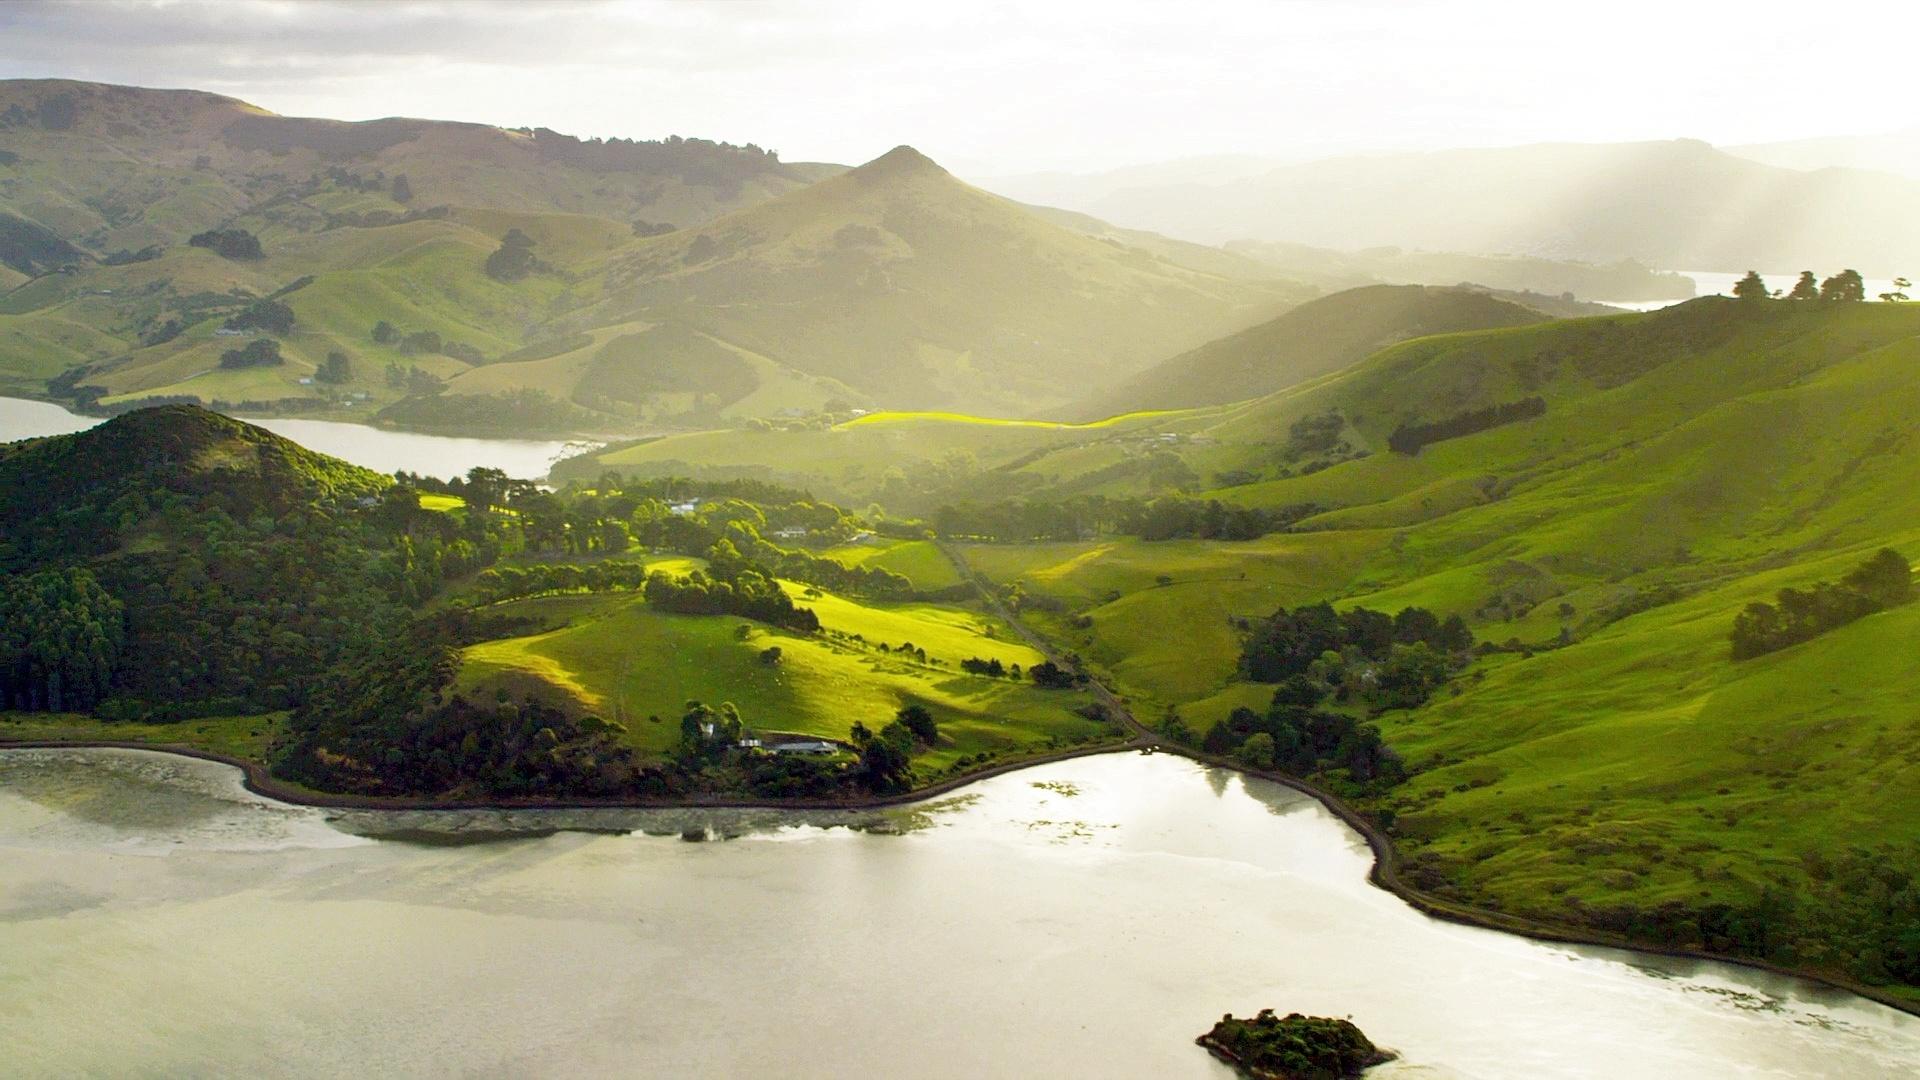 Neuseeland entdecken | spiegel.tv